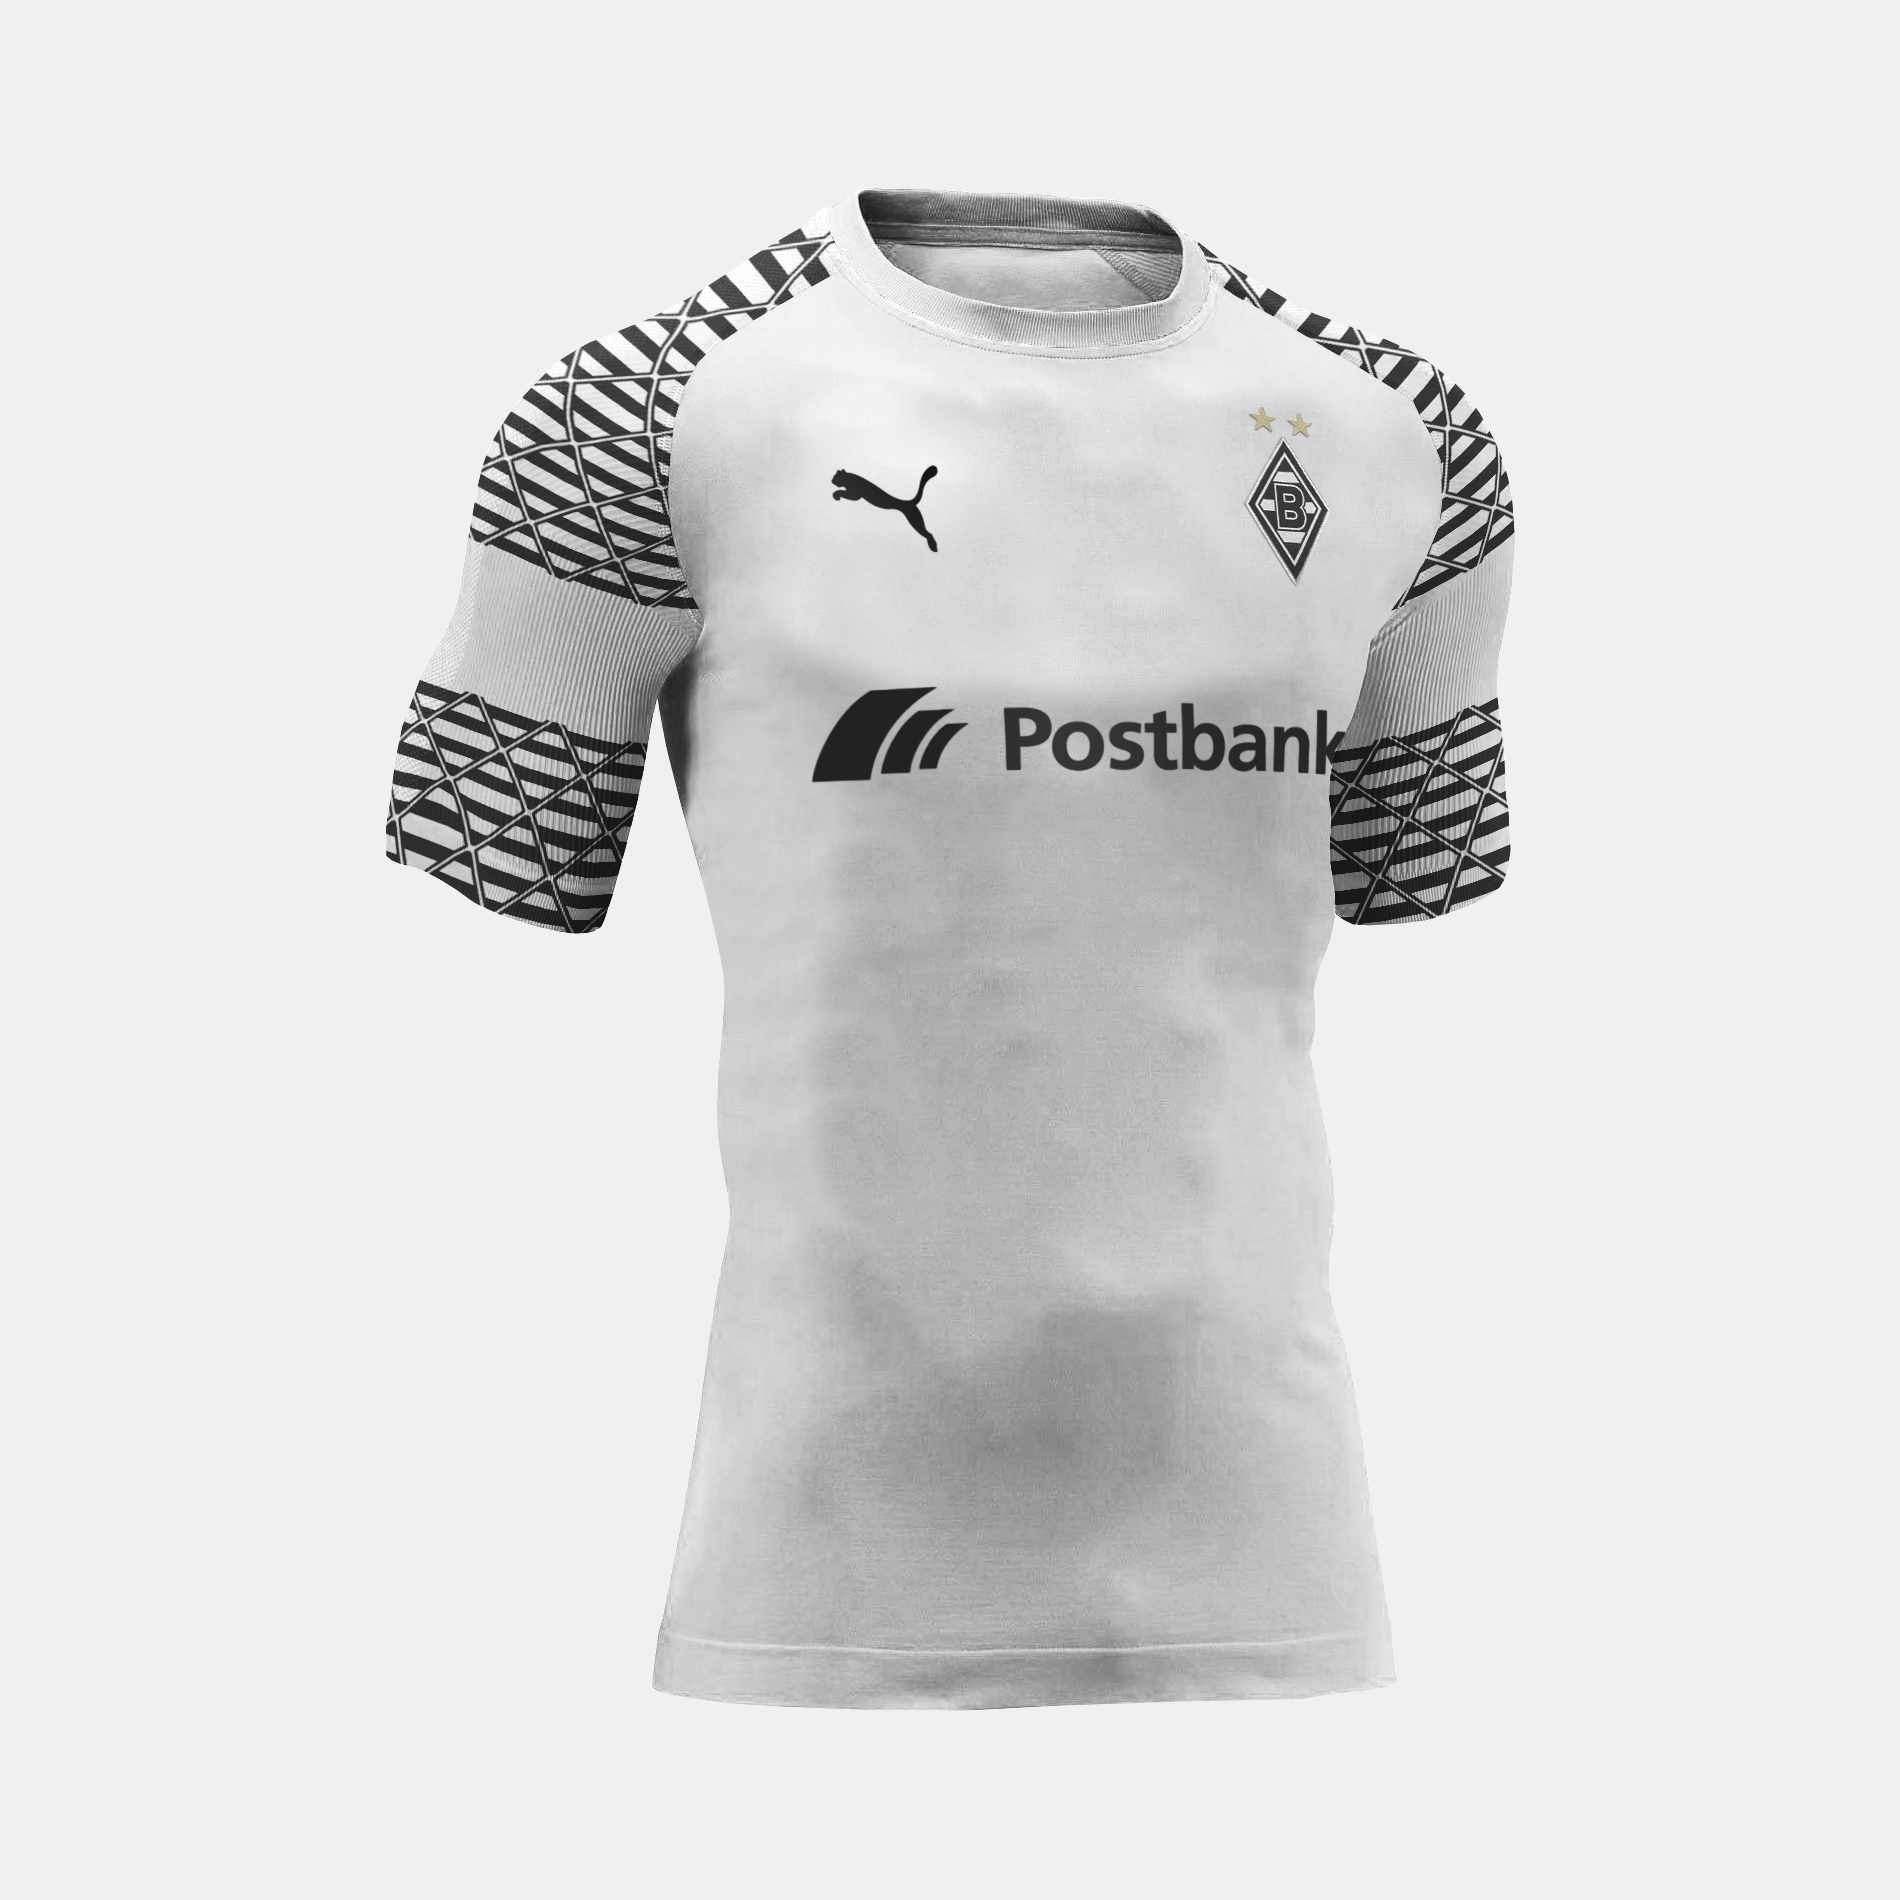 Borussia Mönchengladbach All Black Kit / Borussia ...